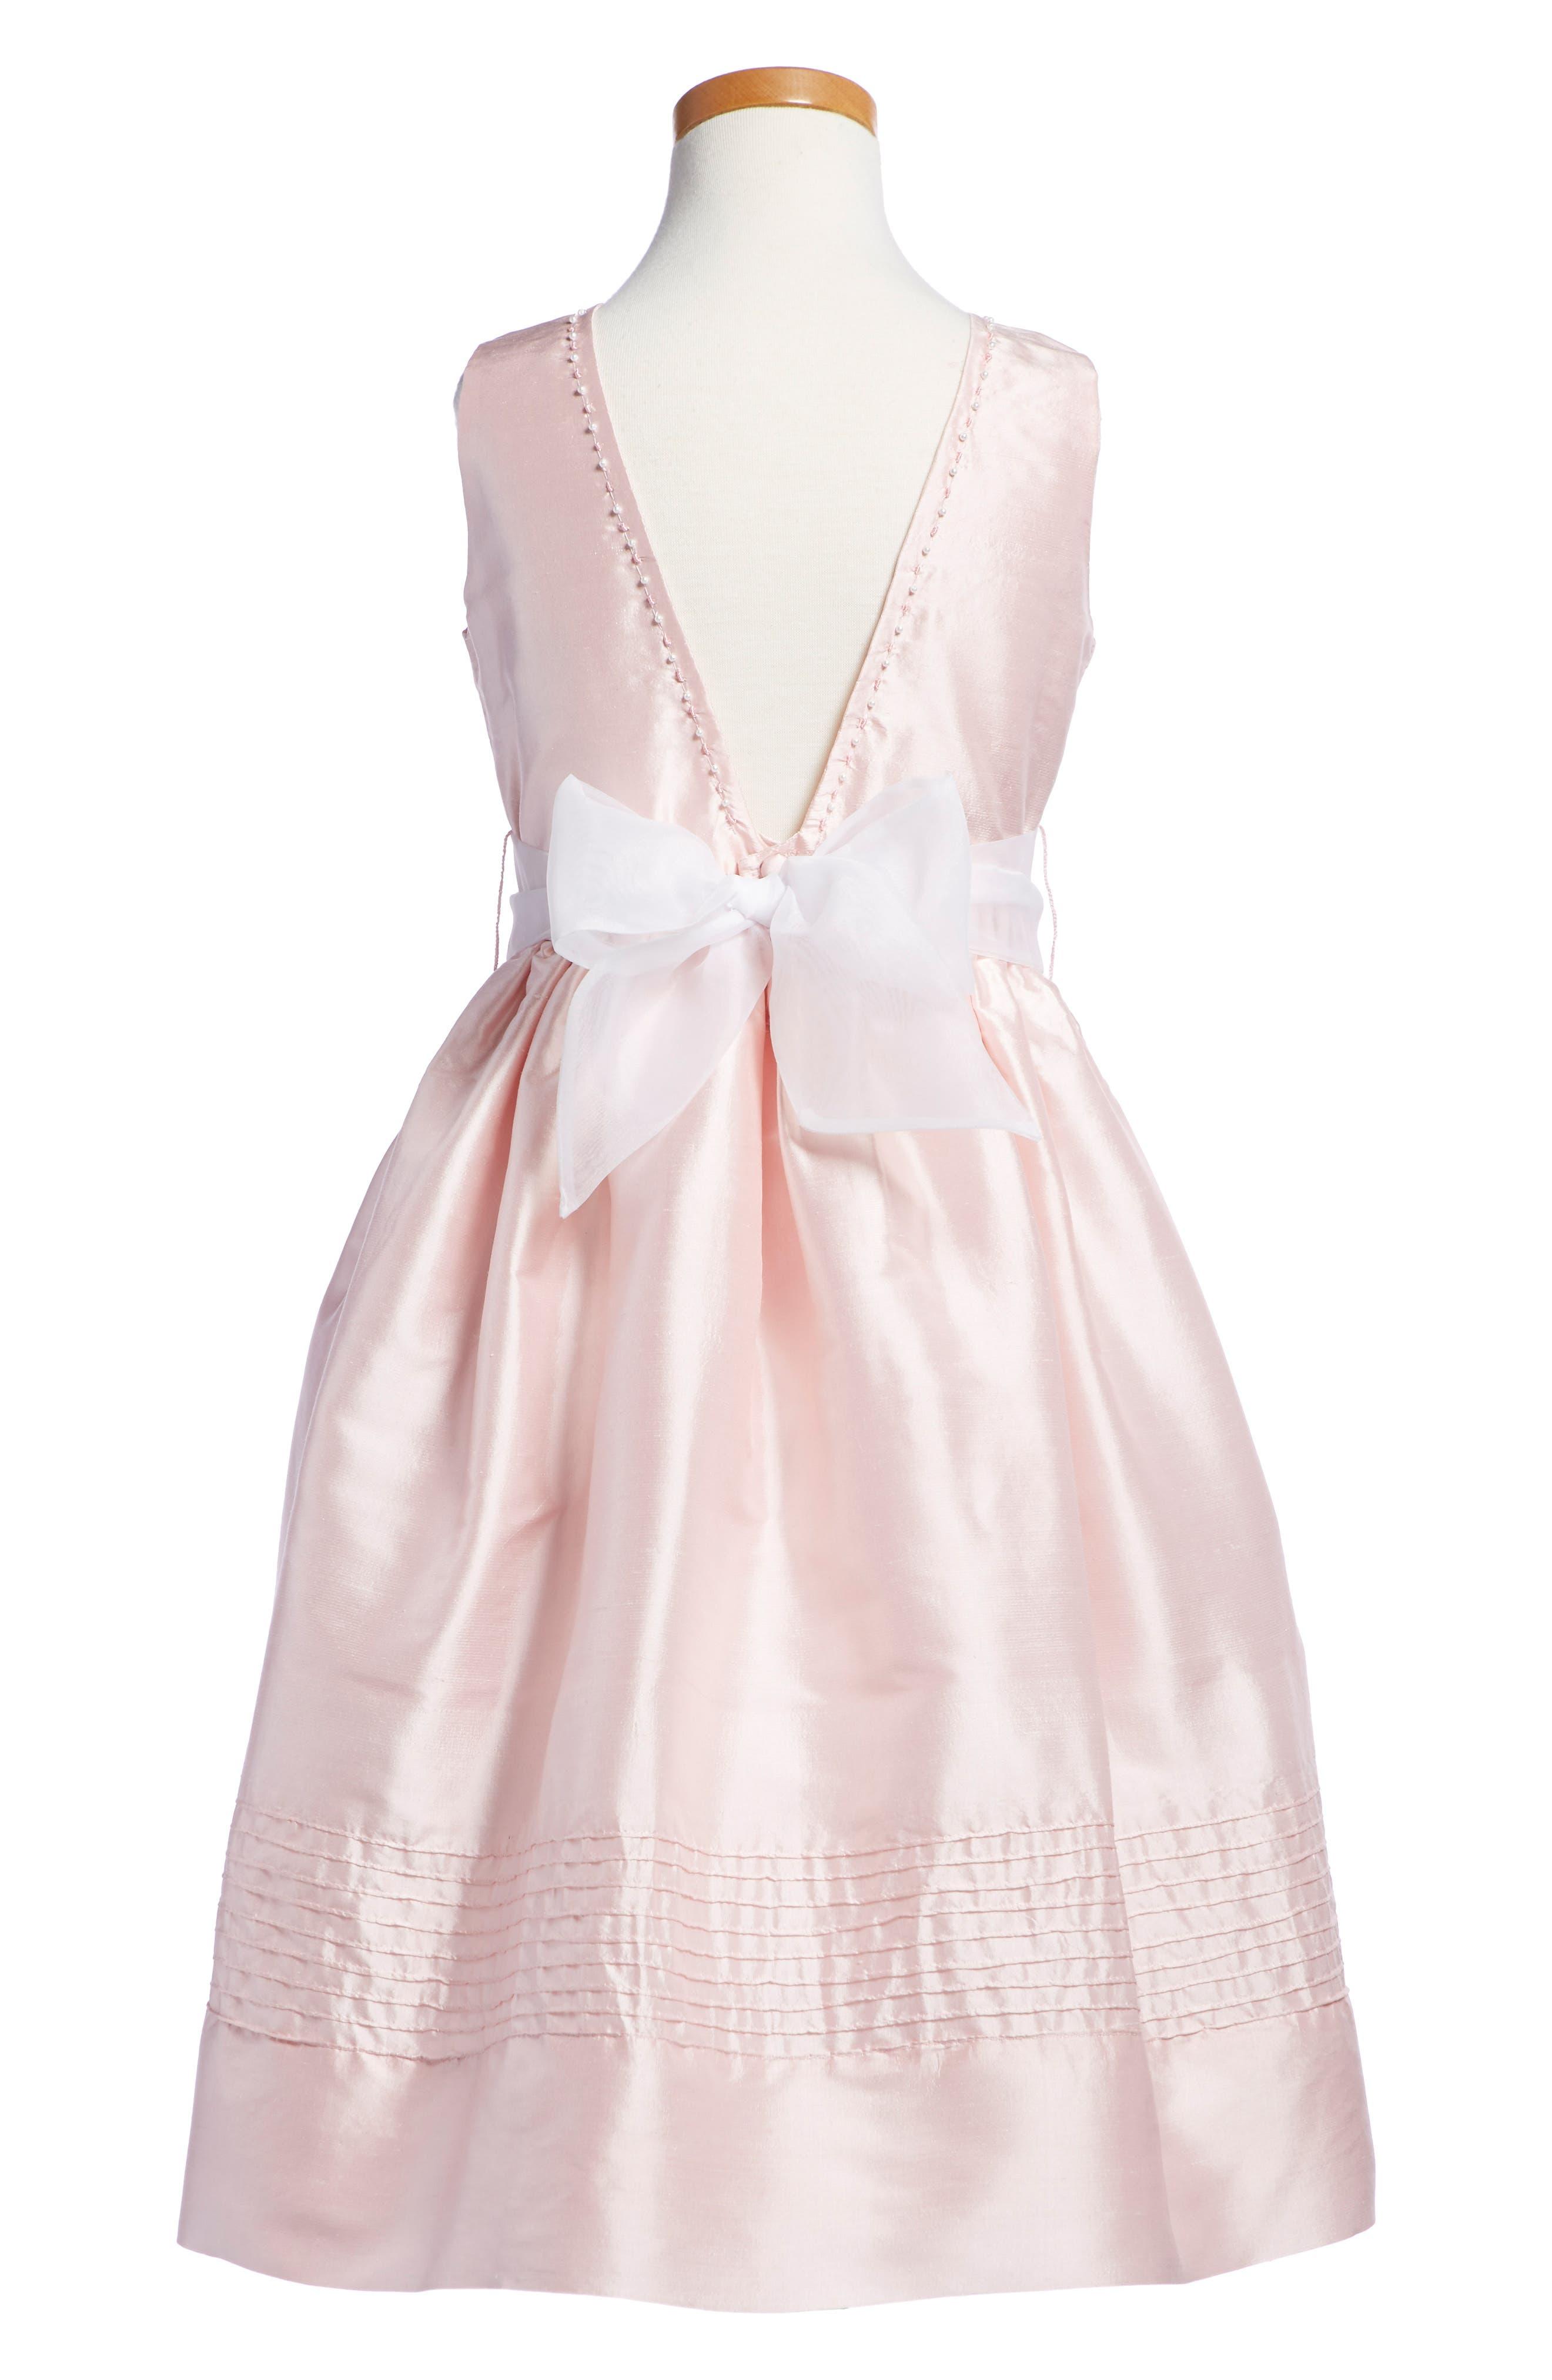 'Melody' Sleeveless Dress,                             Alternate thumbnail 3, color,                             689